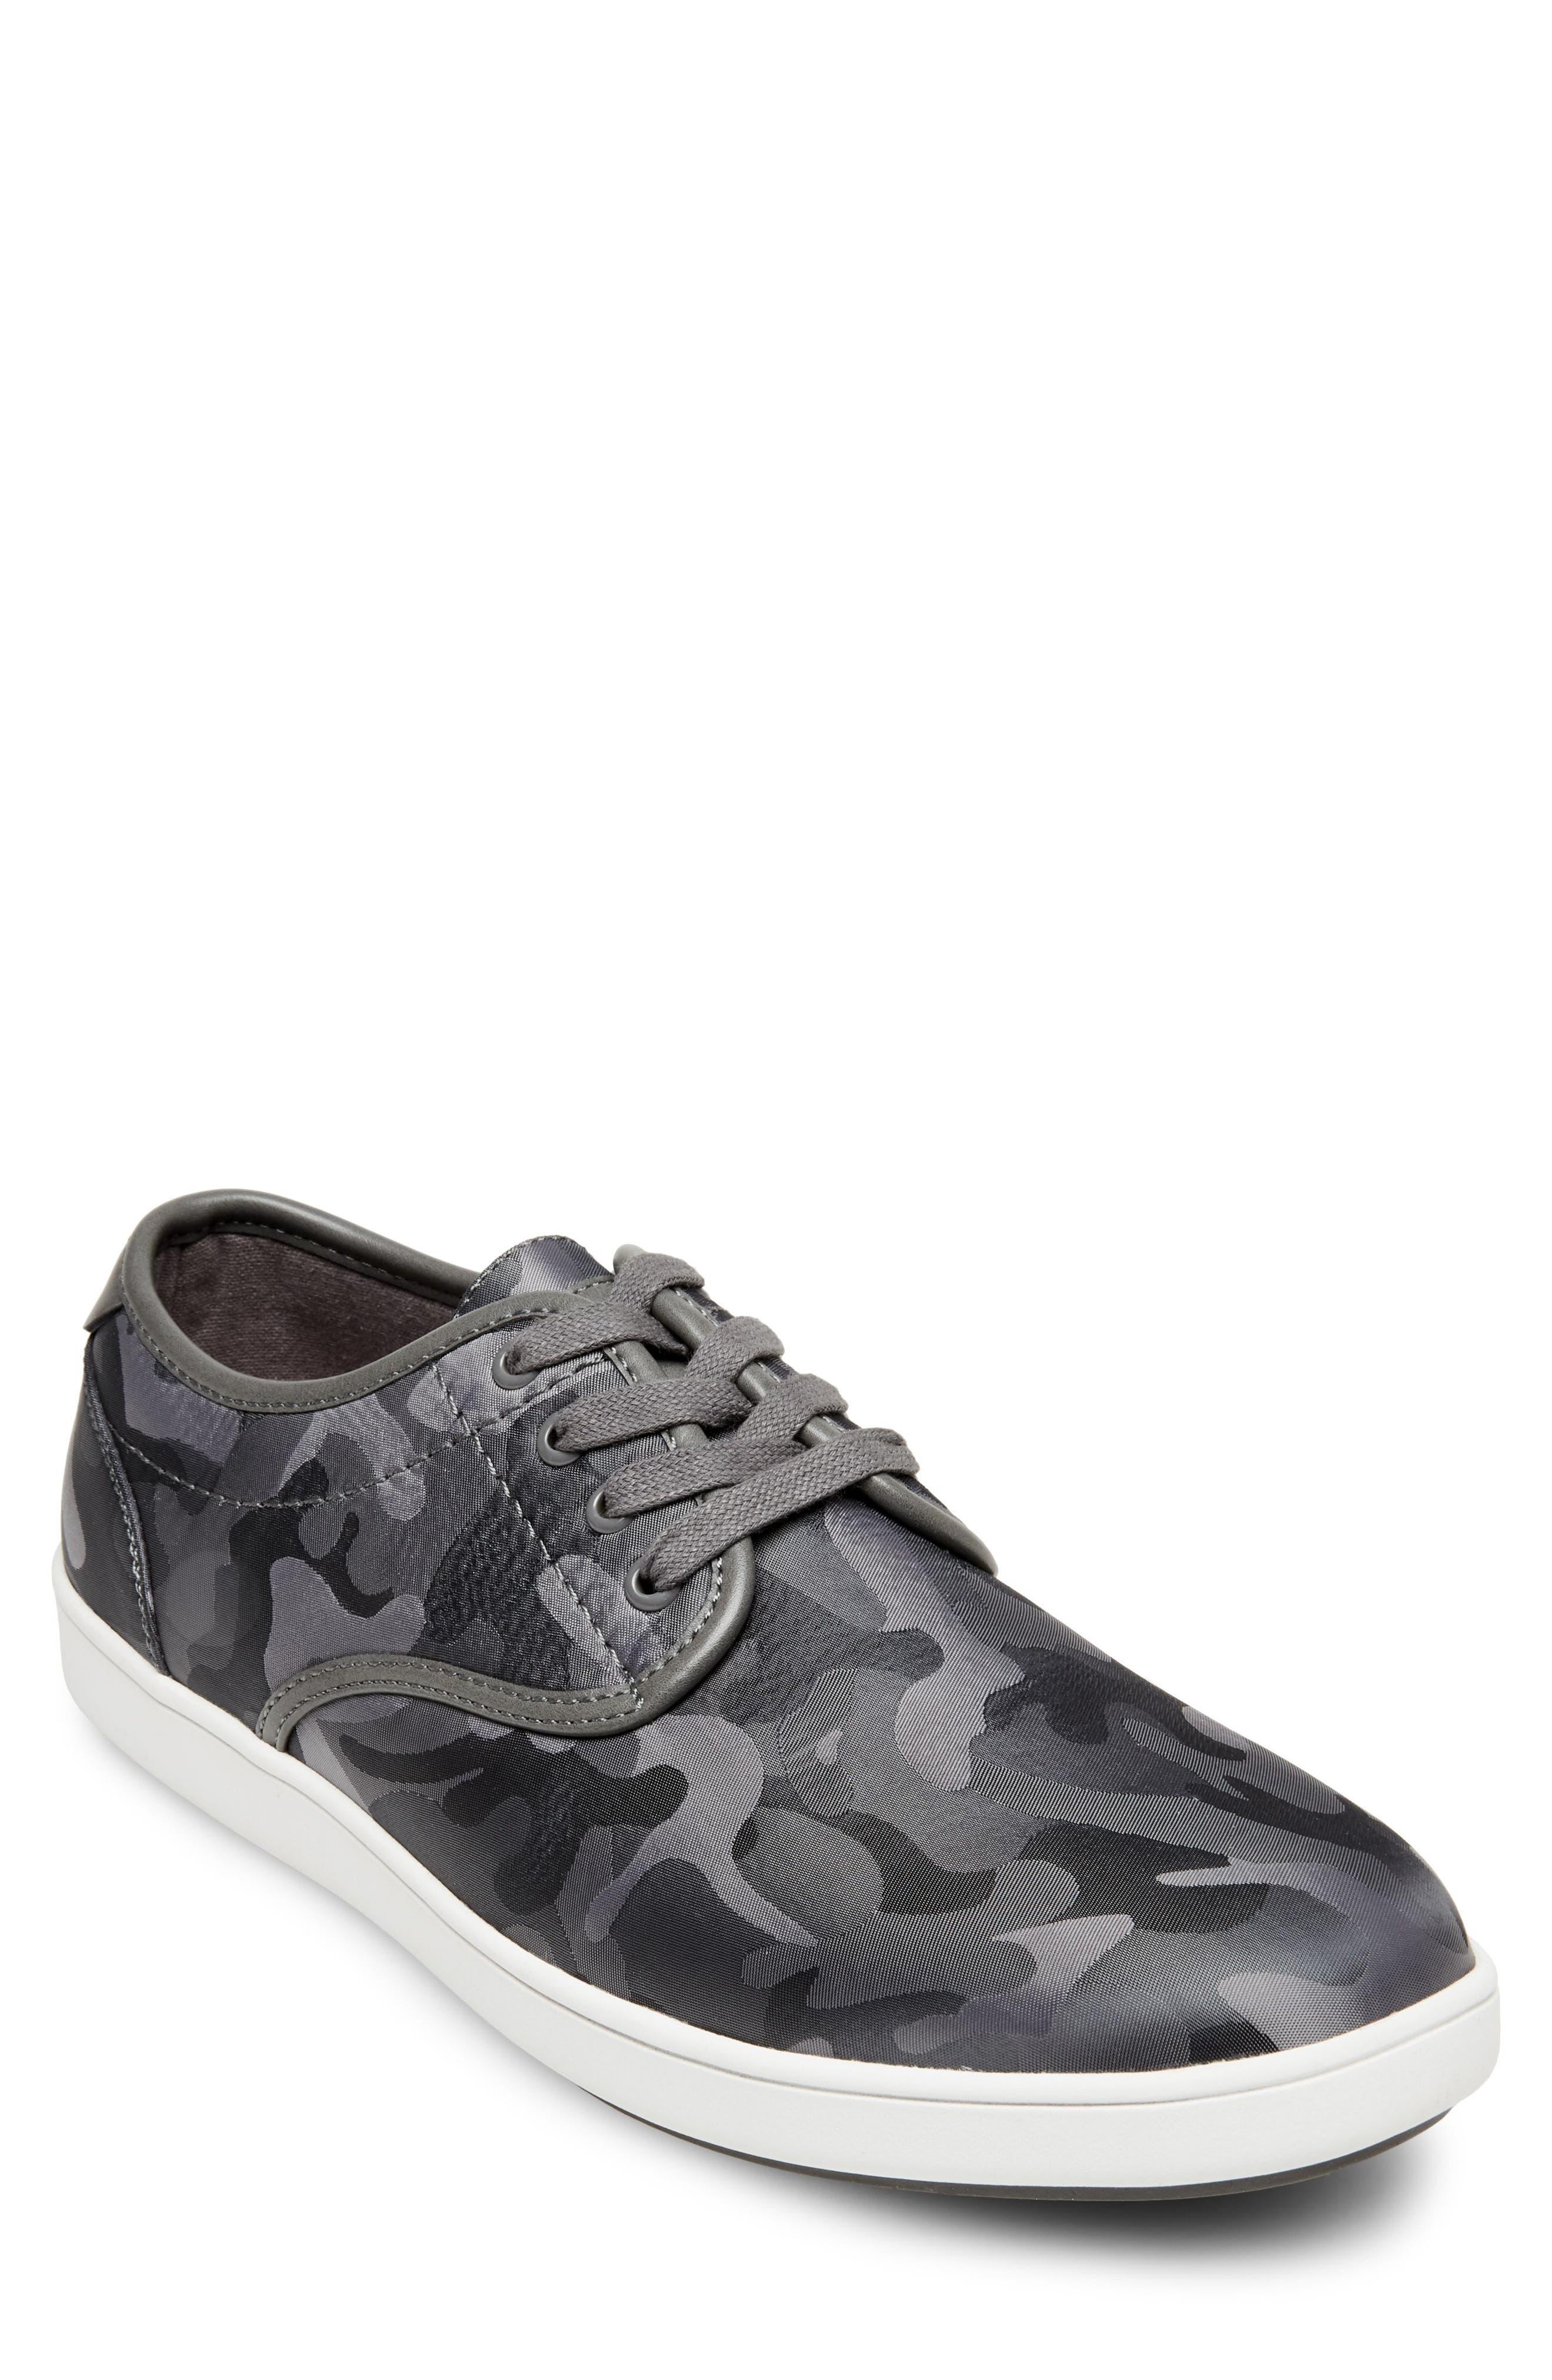 Frenzo Camo Sneaker,                         Main,                         color, GREY CAMO FABRIC